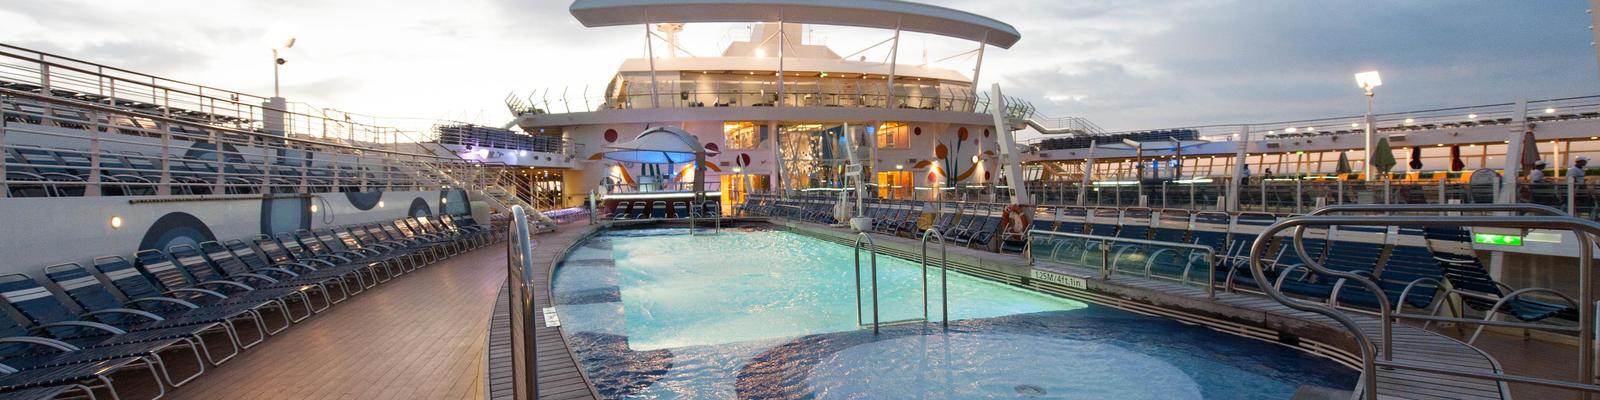 Royal Caribbean Allure of the Seas Cruise Ship